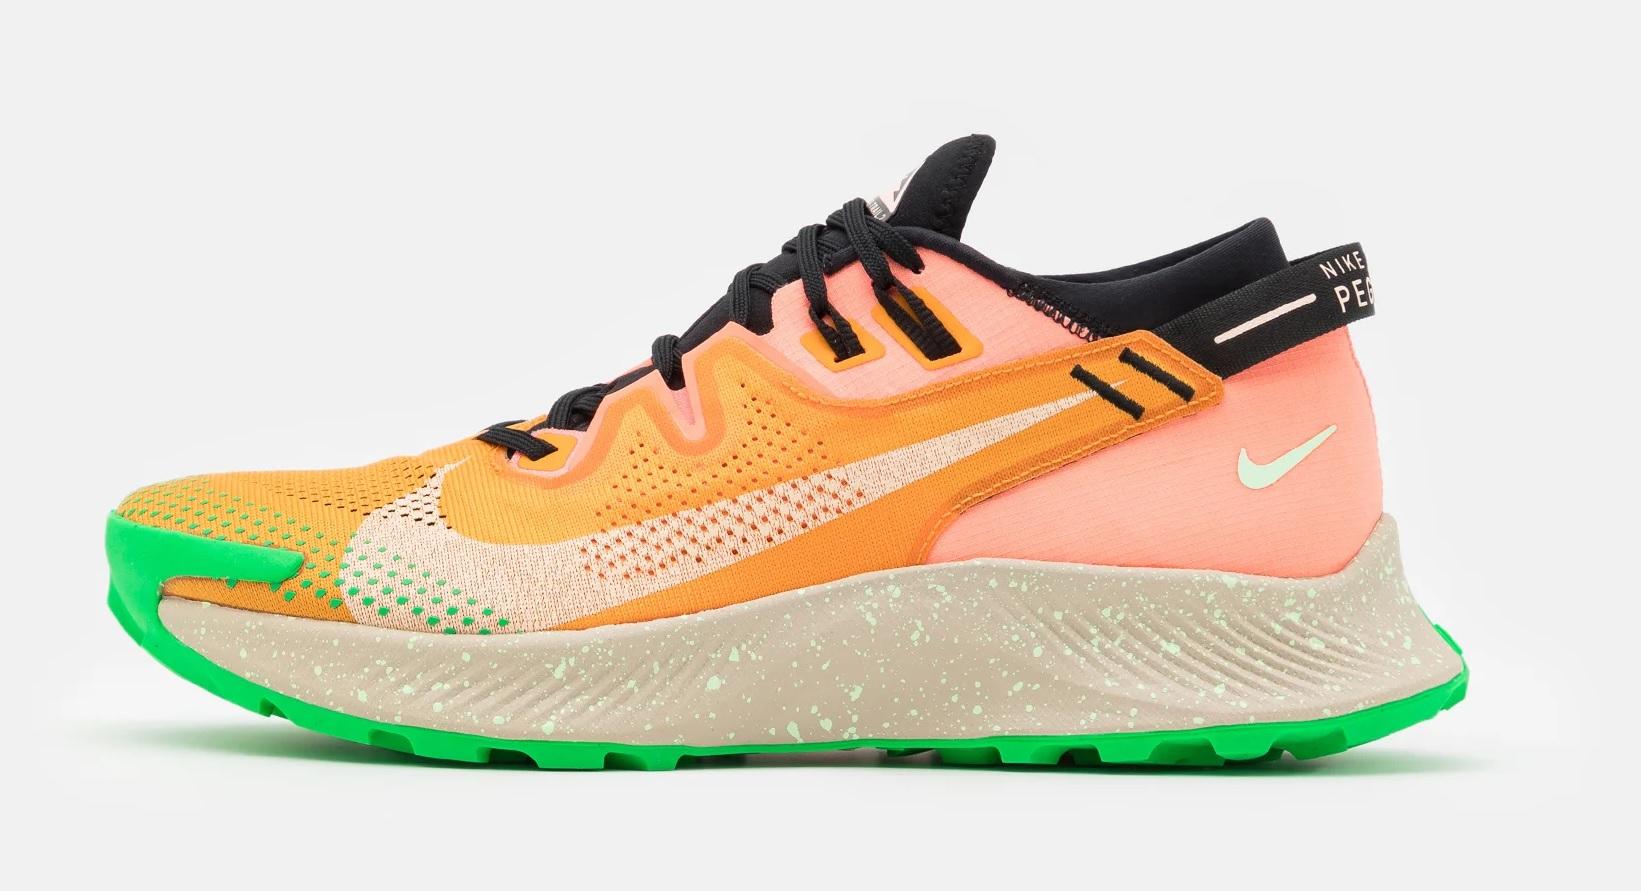 Zapatillas Nike Pegasus 2 Trail, Corte Ingles de Coruña